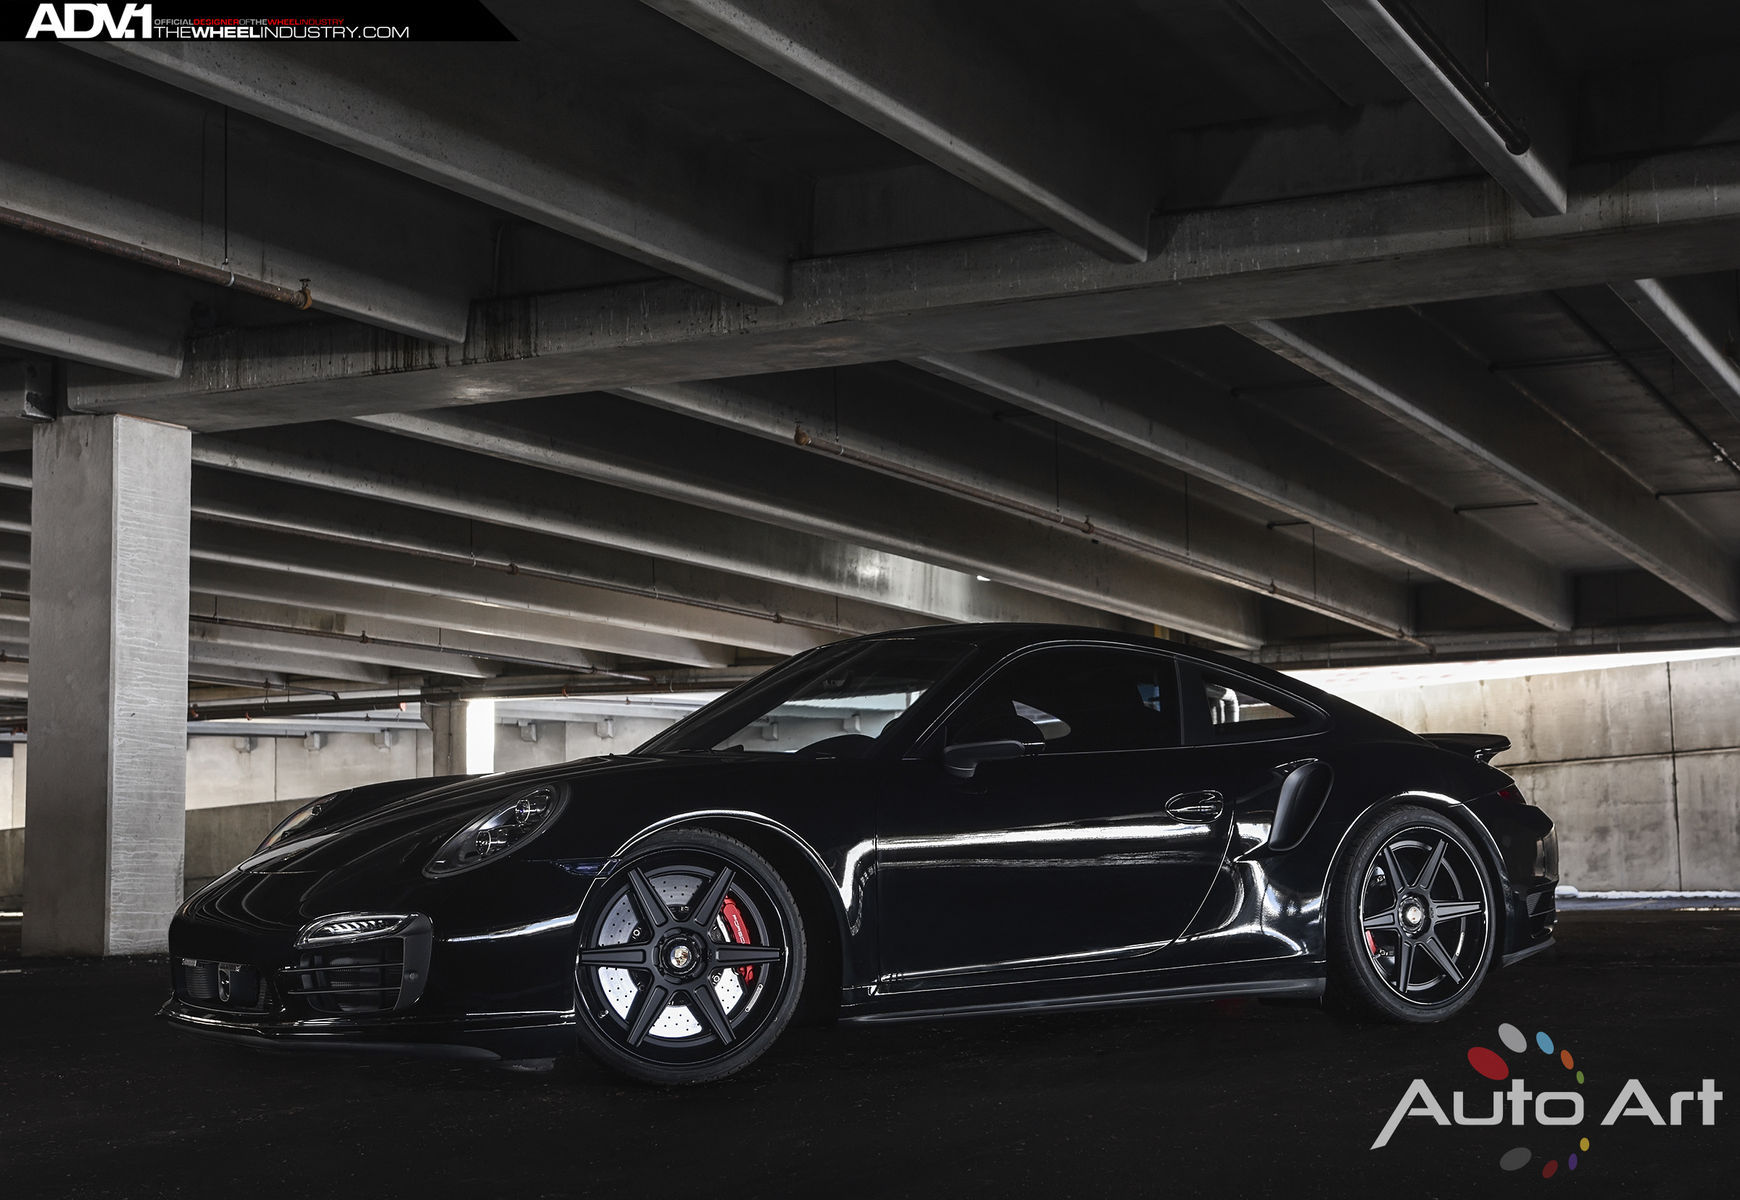 1900 Porsche 911 | Porsche Turbo S